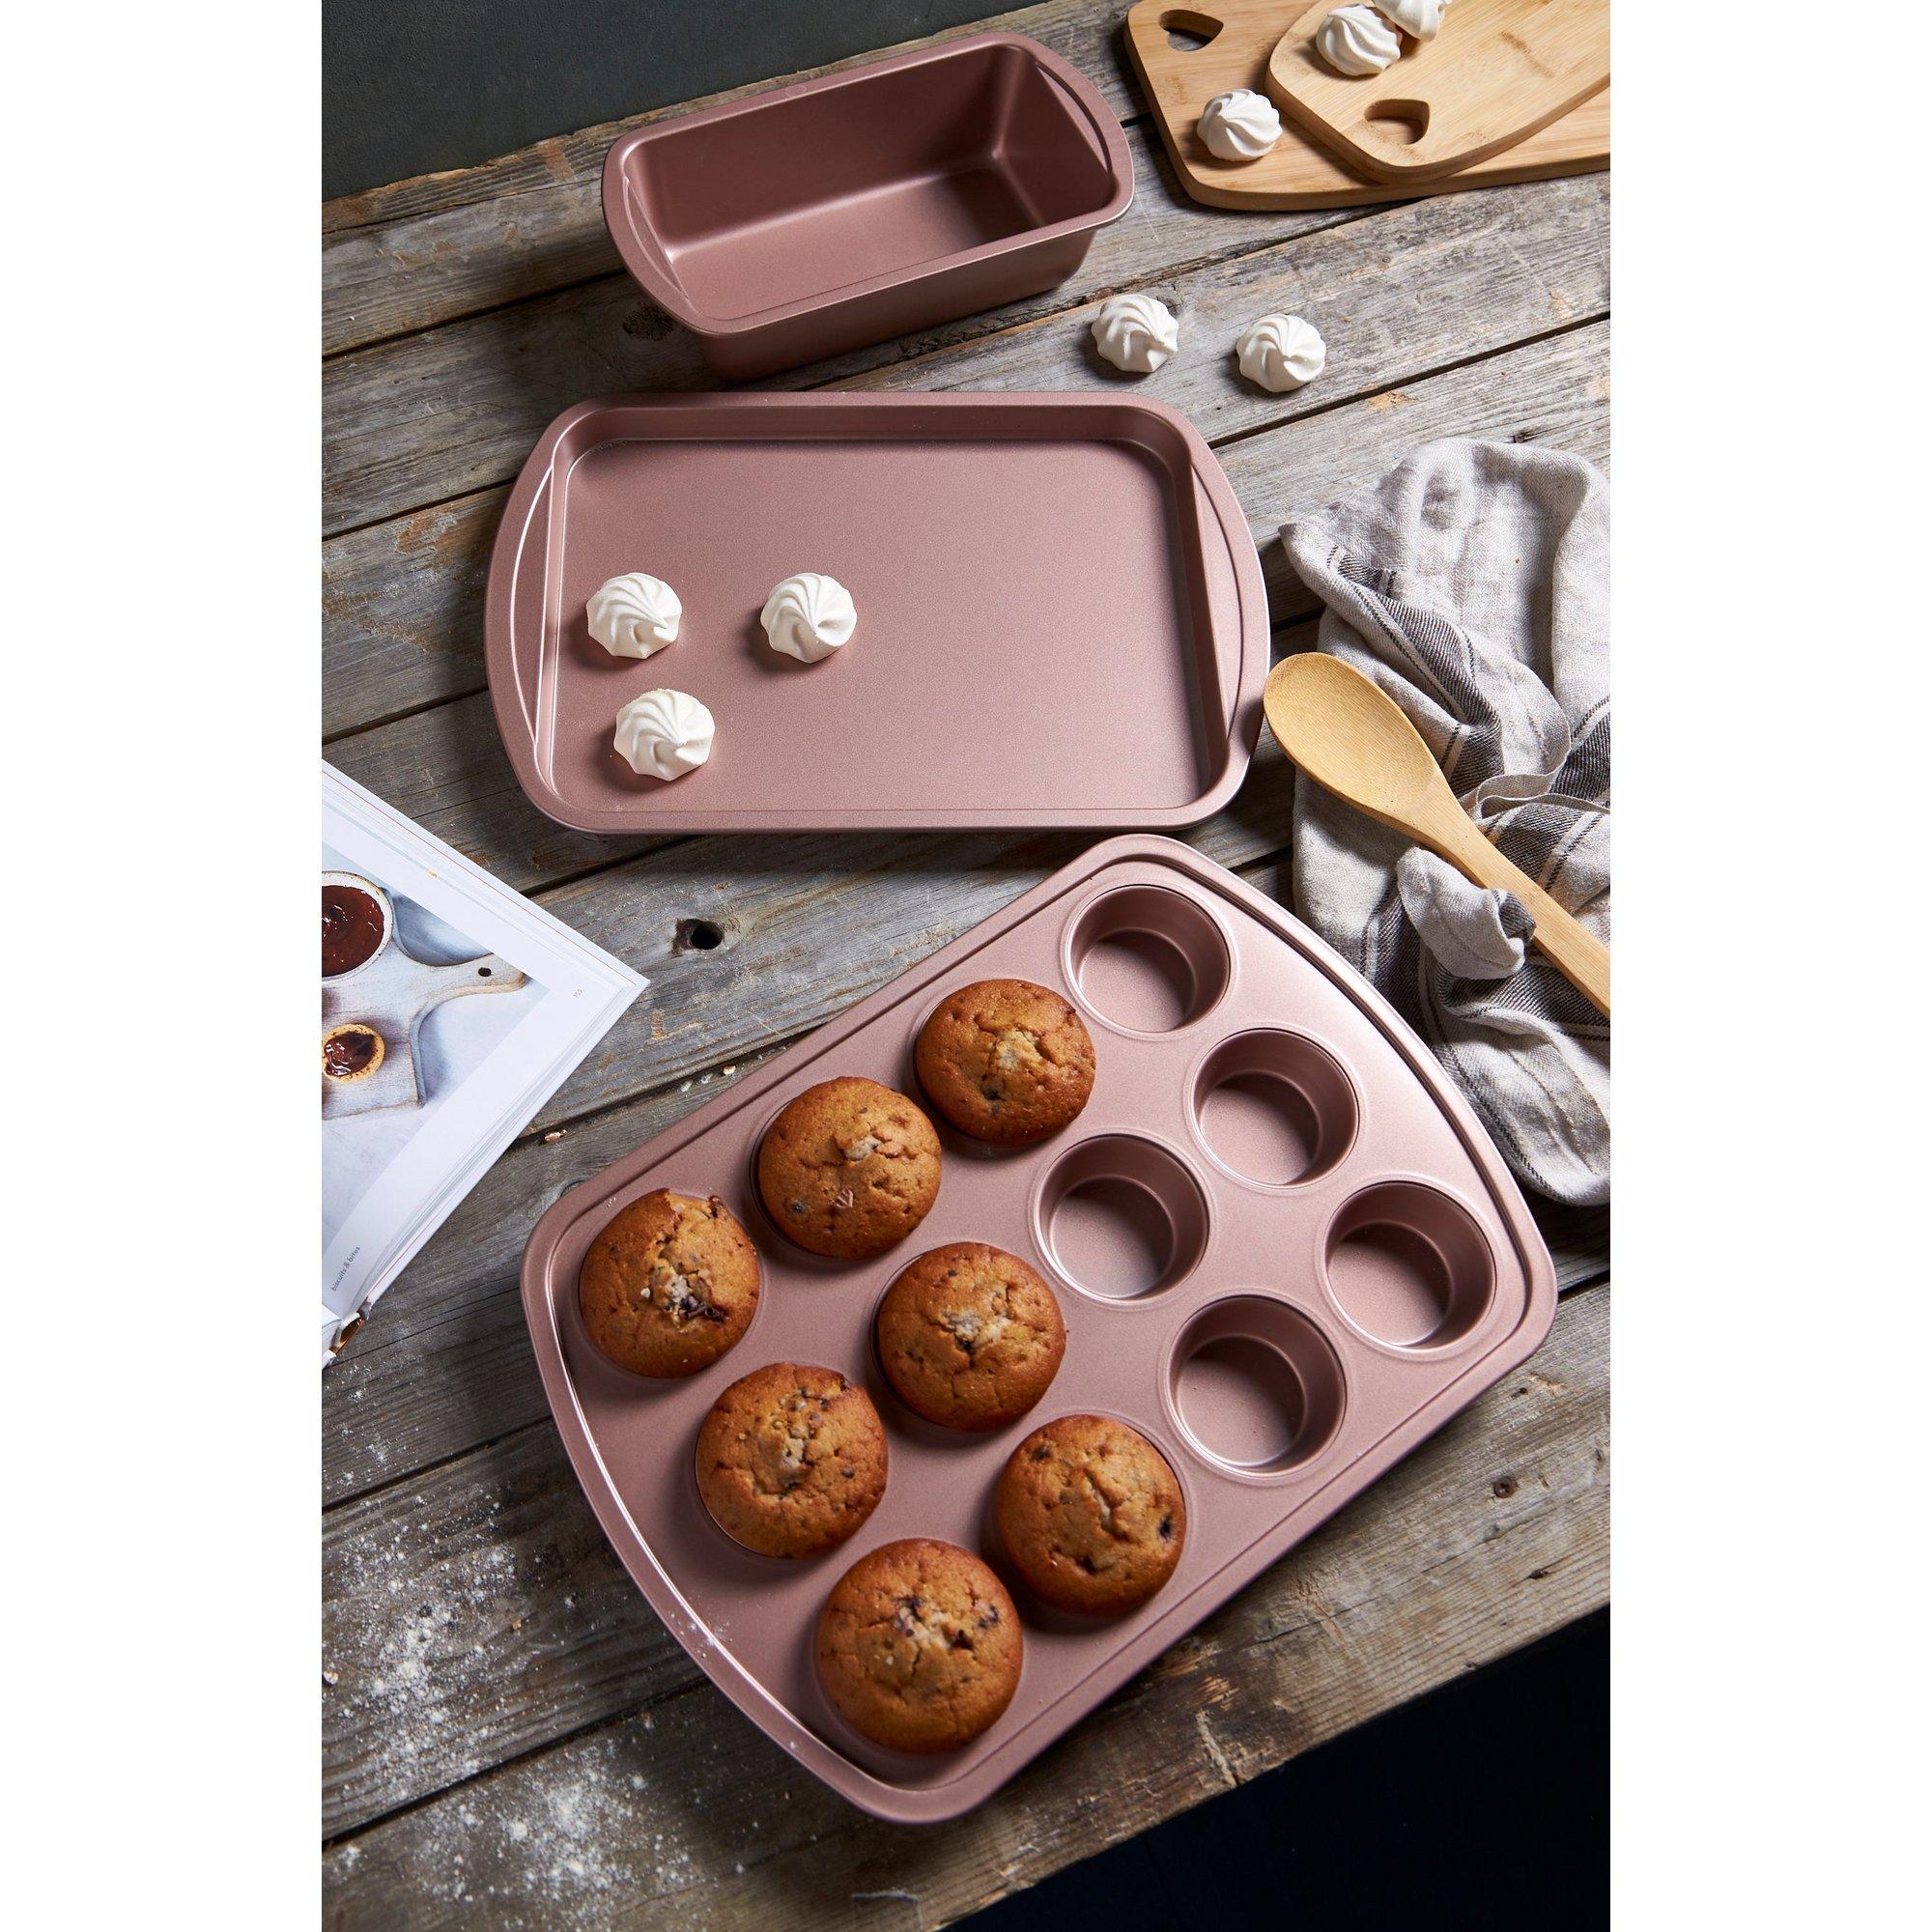 Image of 3-Piece Pink Bakeware Set